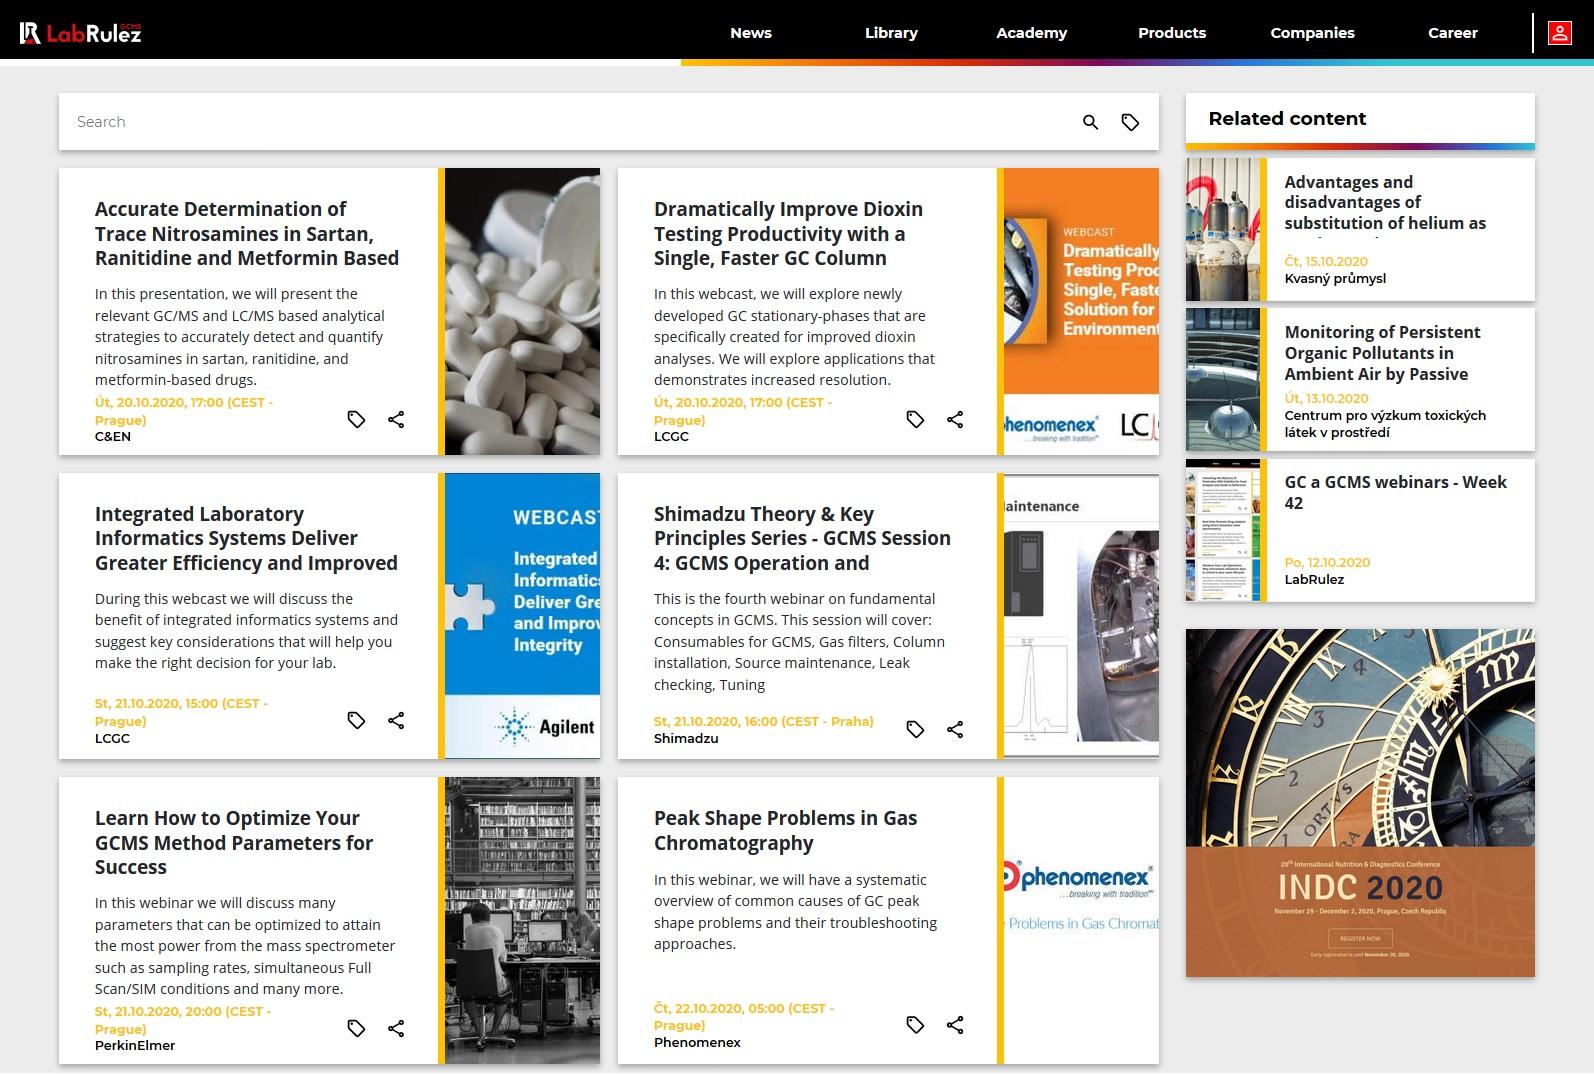 LabRulez: GC and GCMS webinars - Week 43